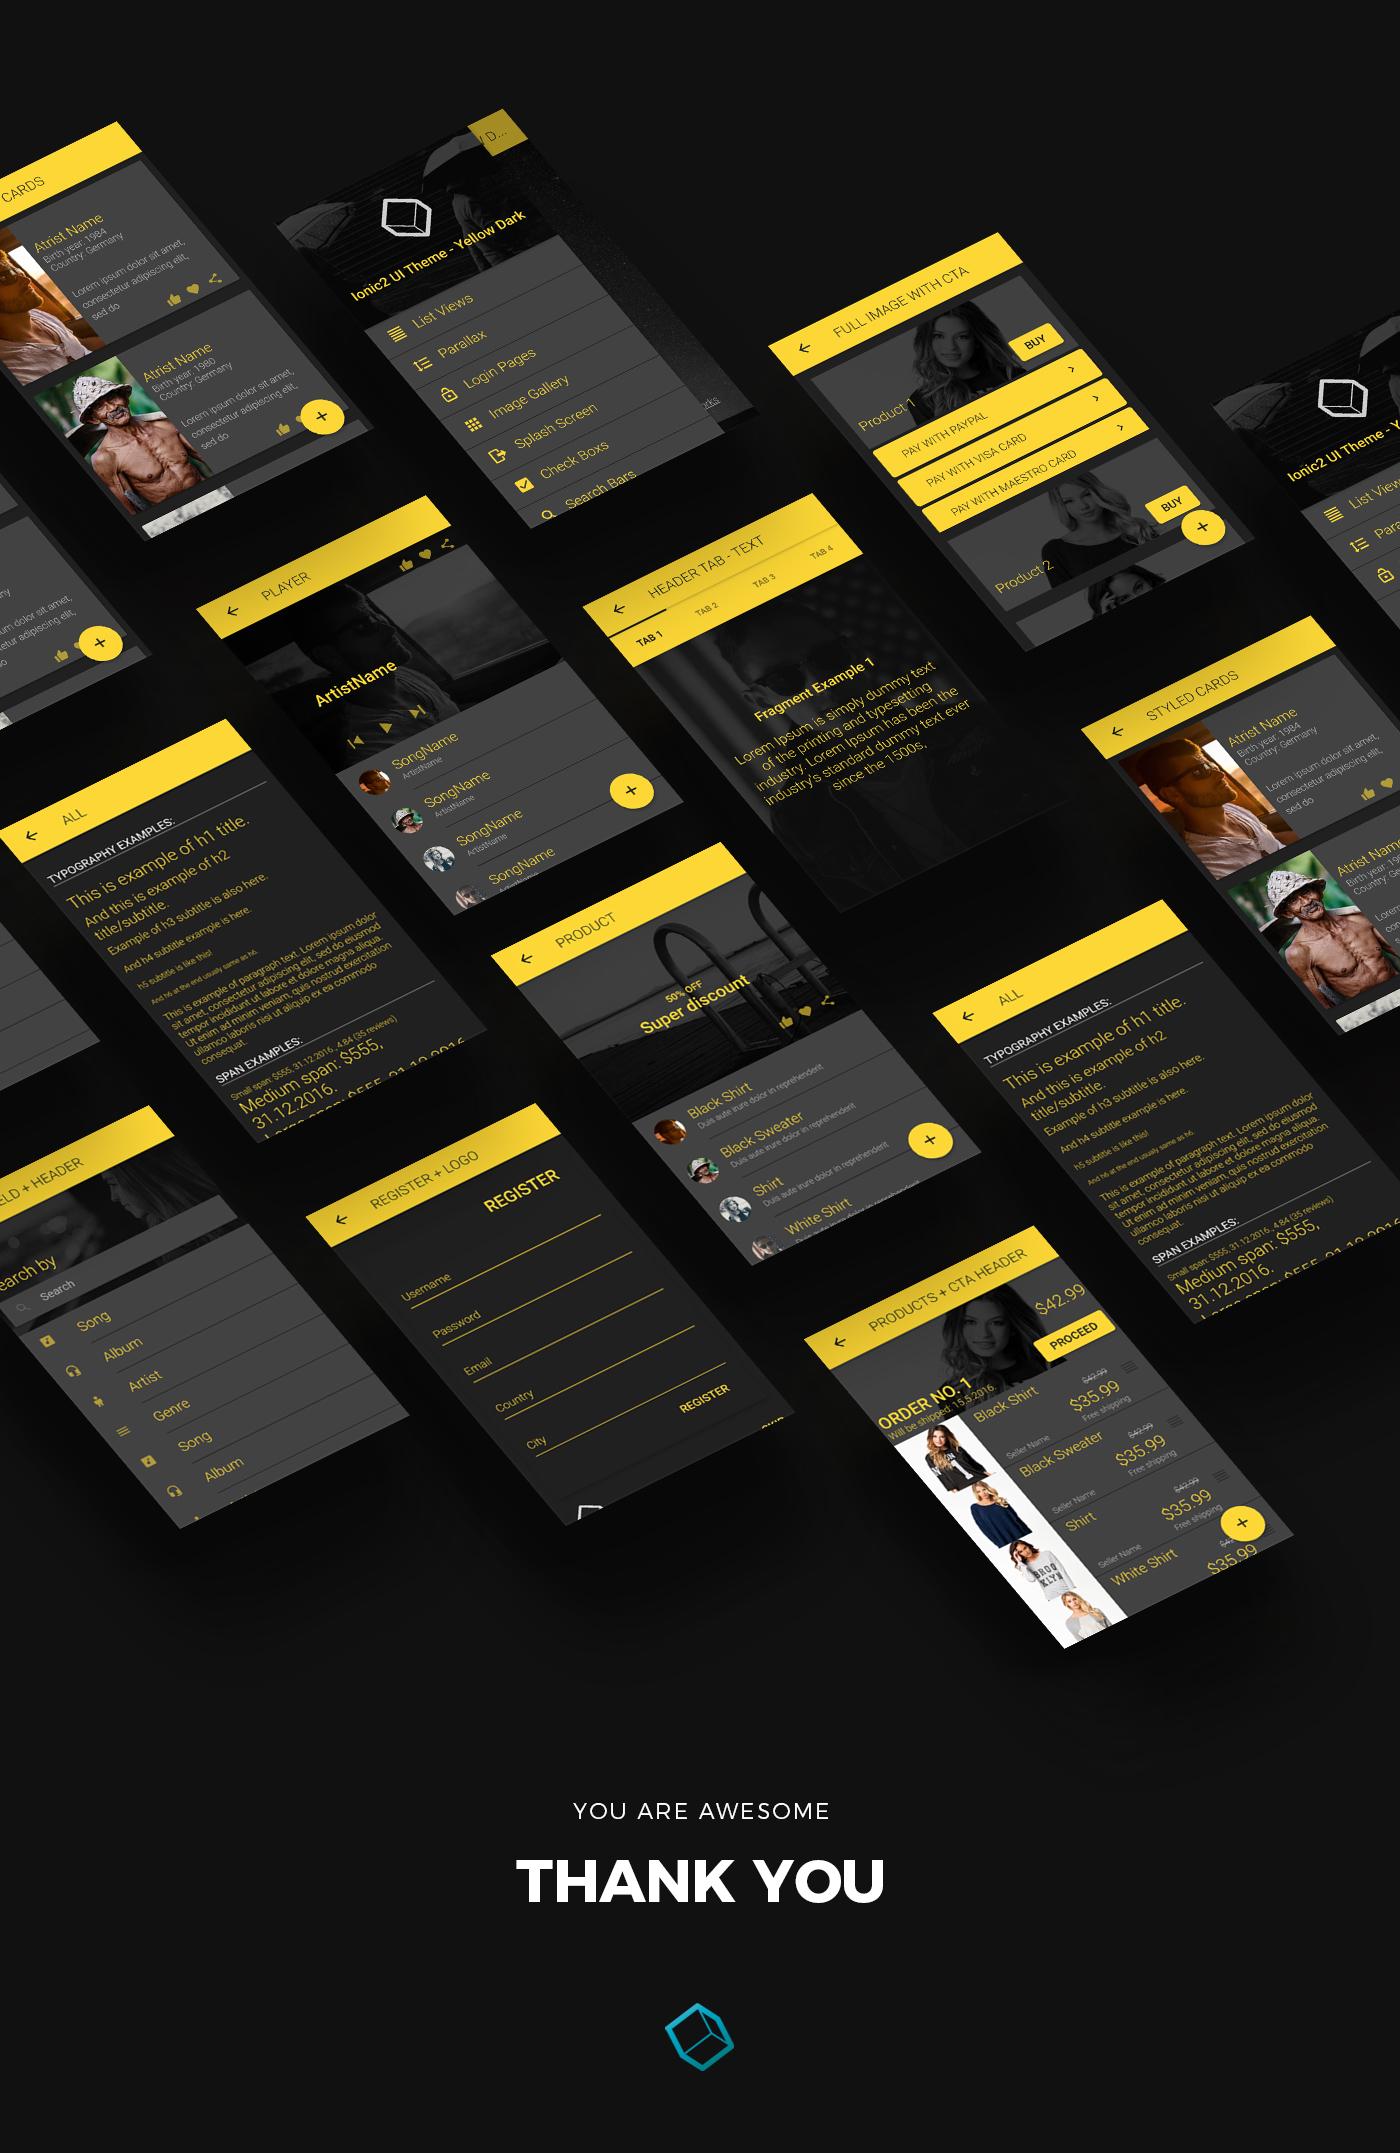 ionic 3 ui theme  template app  u2013 material design  u2013 yellow